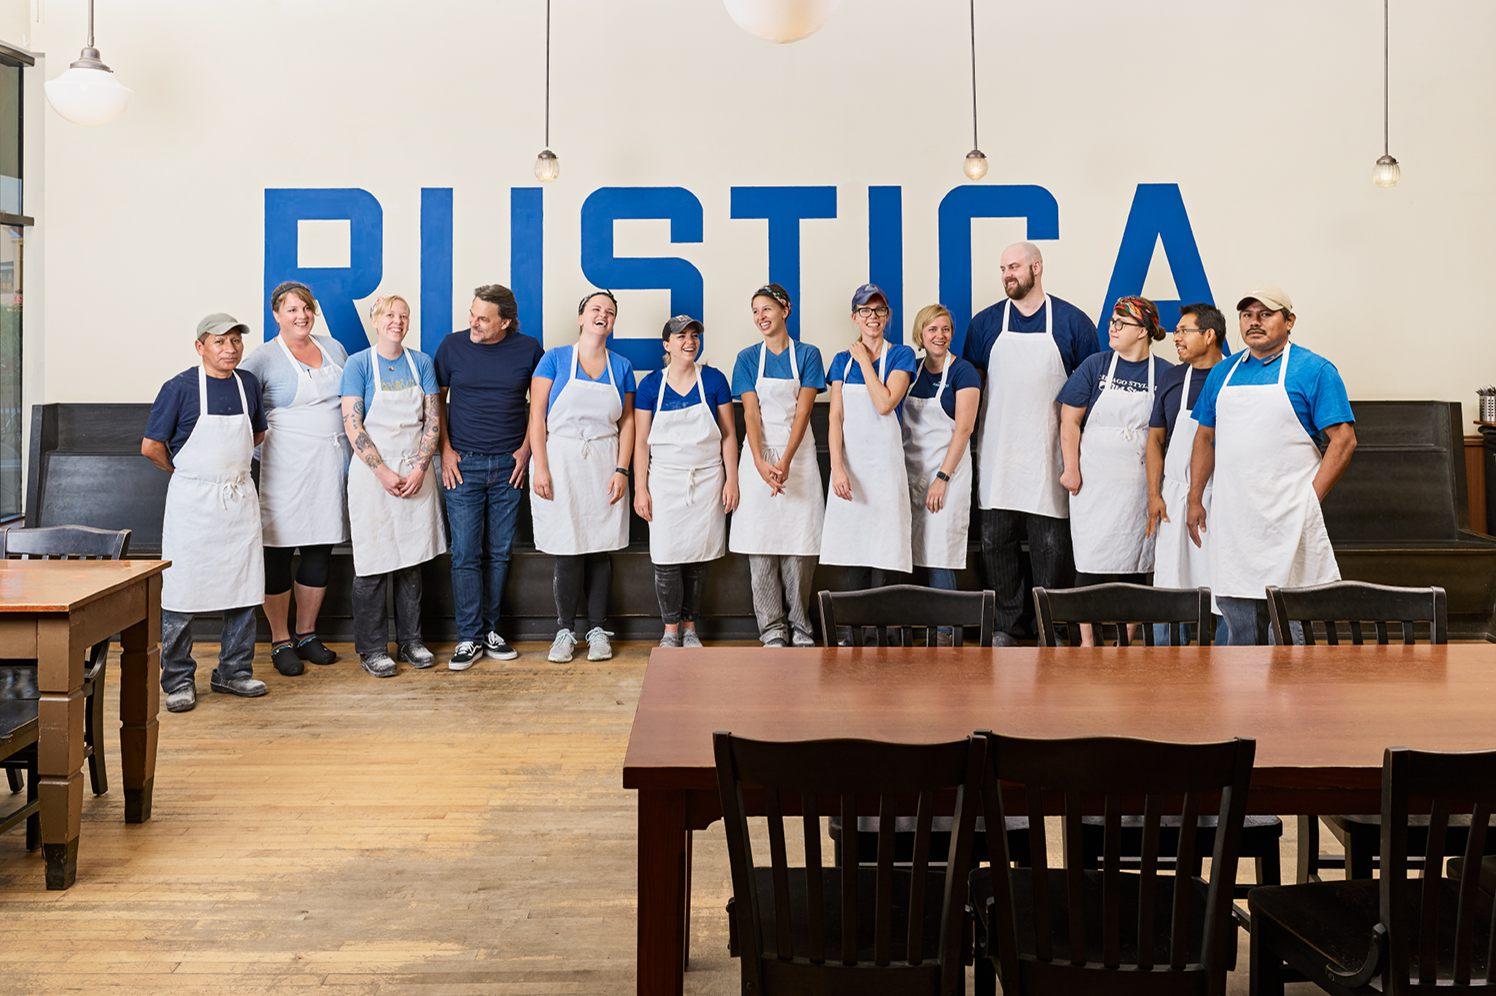 rustica bakery employees